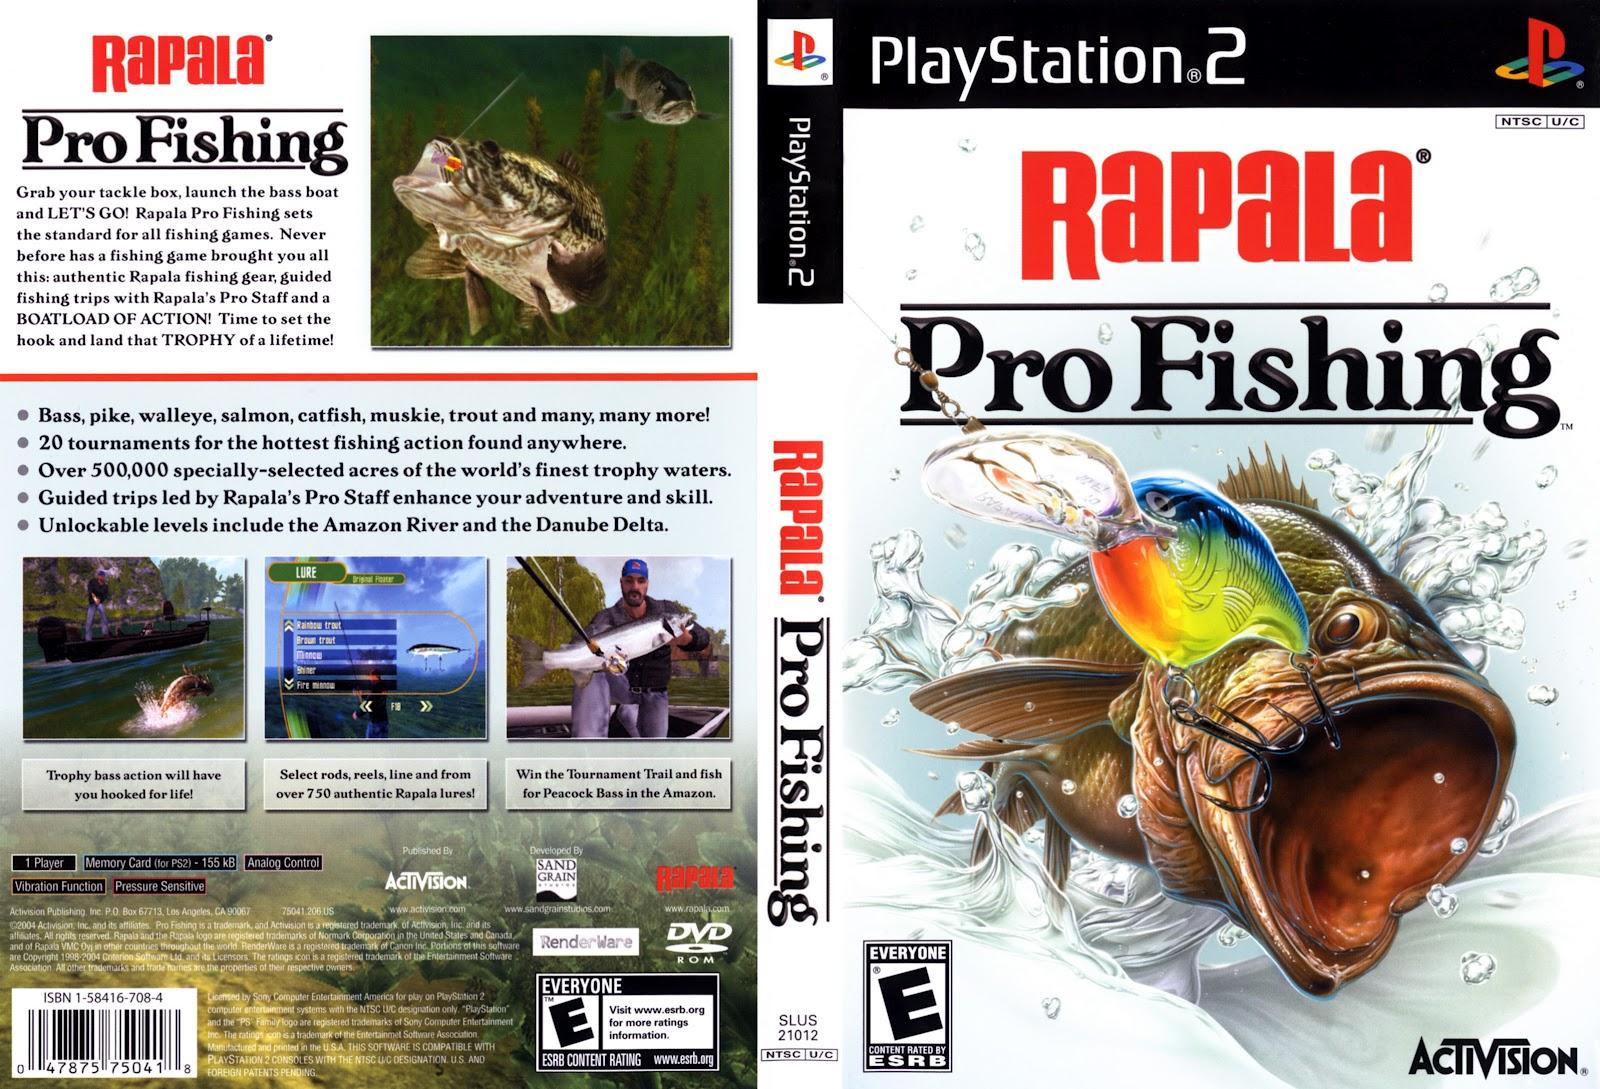 Makajoogames pc rapala pro fishing mediafire for Rapala pro fishing